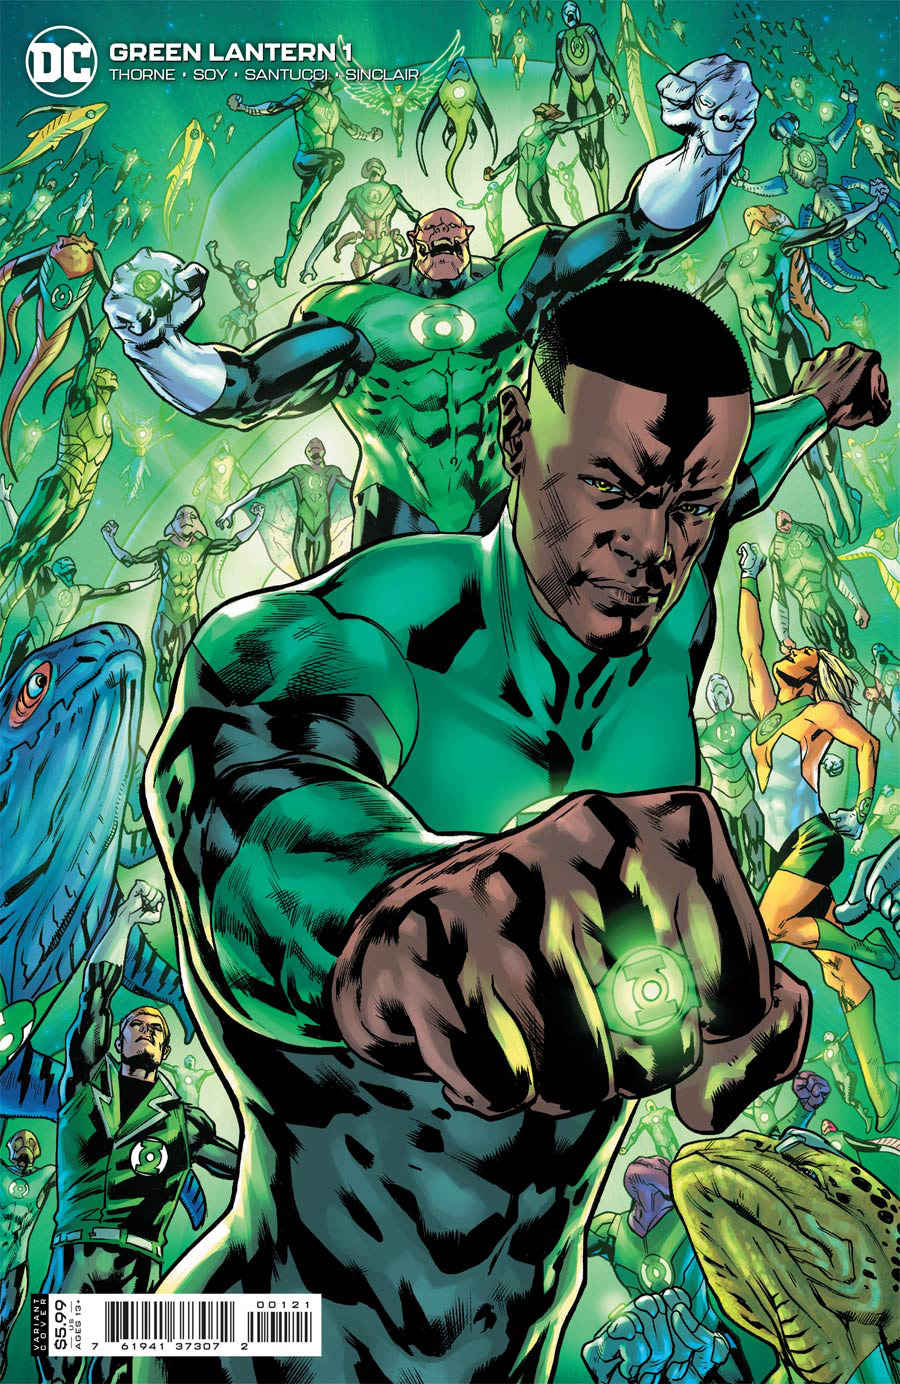 Green Lantern Vol 7 #1 Cover B Variant Bryan Hitch Card Stock Cover